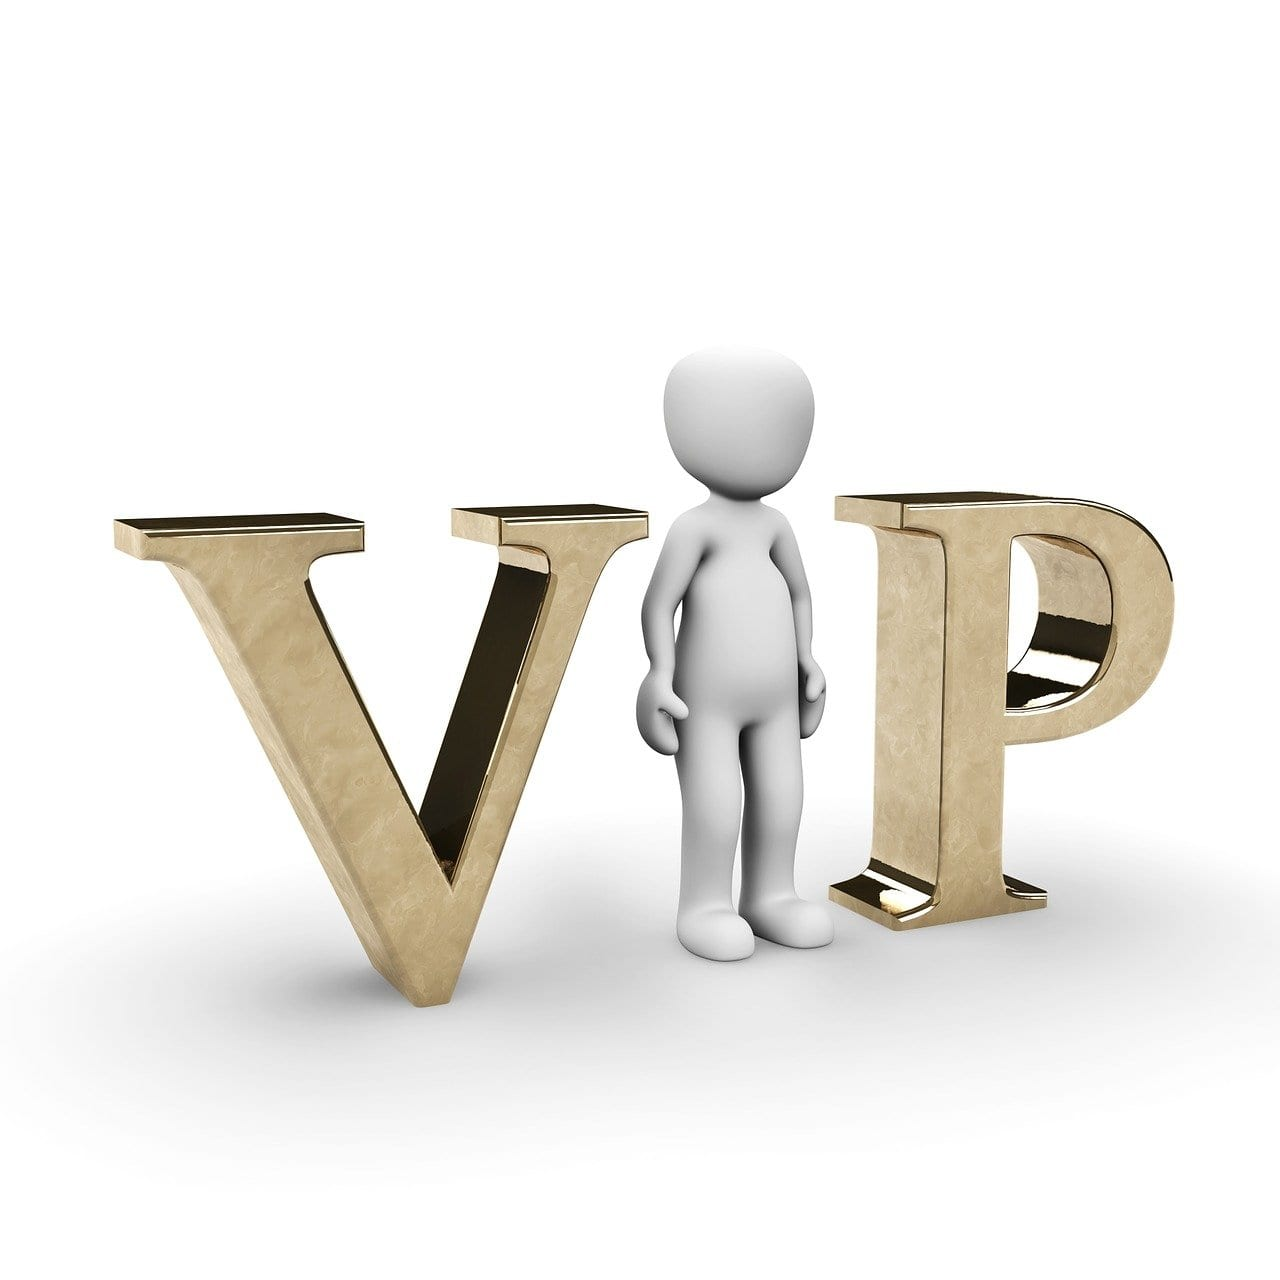 [PLR] Webinars and VIPs